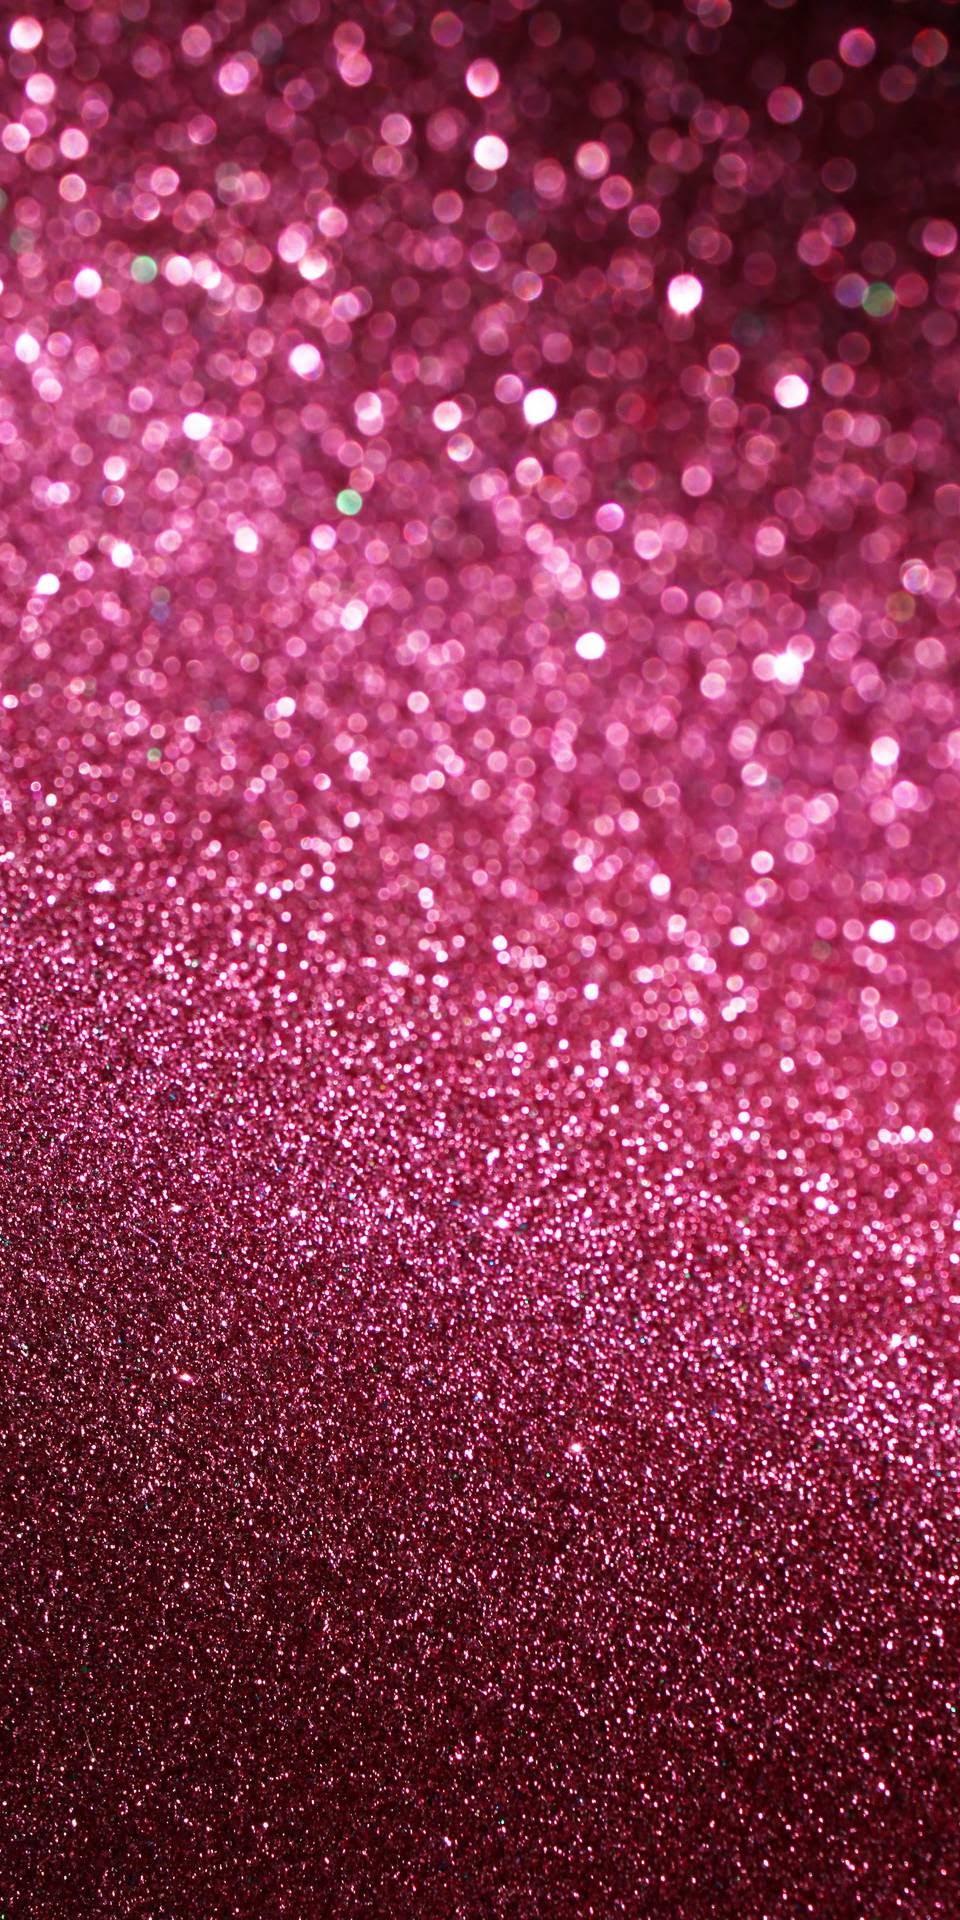 Free Pink_Shine-a8c21366-b61f-387e-a5ba-ca15e6ea8e92.jpg phone wallpaper by kmcrawley7